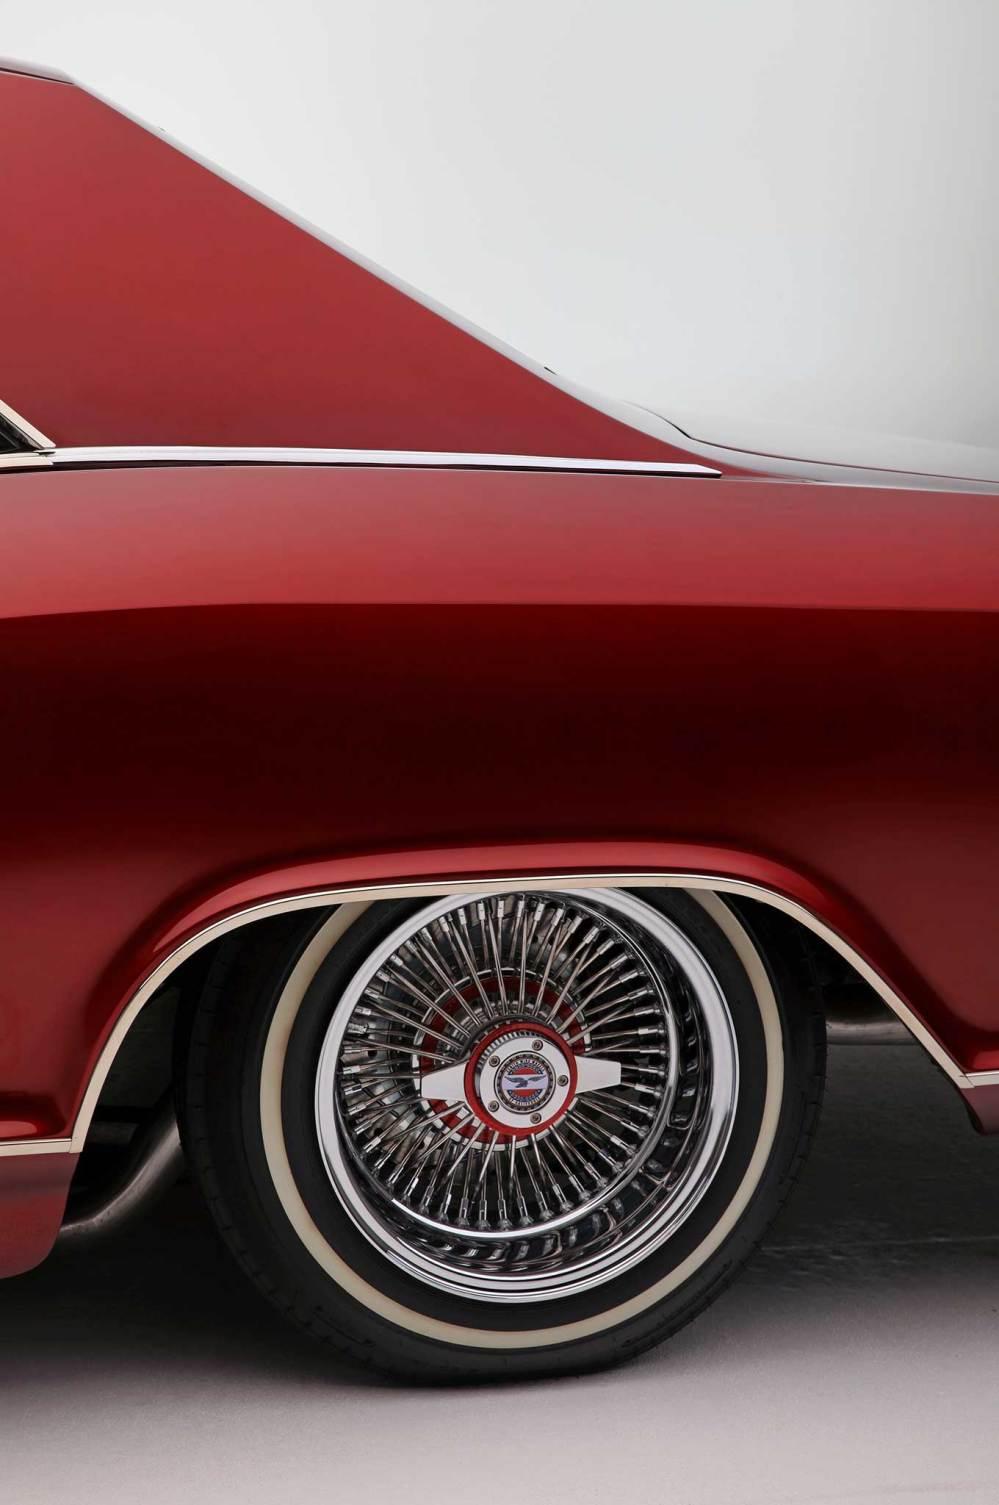 medium resolution of 1965 buick riviera chrome zenith wire wheel lowrider rh lowrider com 1965 buick riviera wiring harness 1964 buick riviera